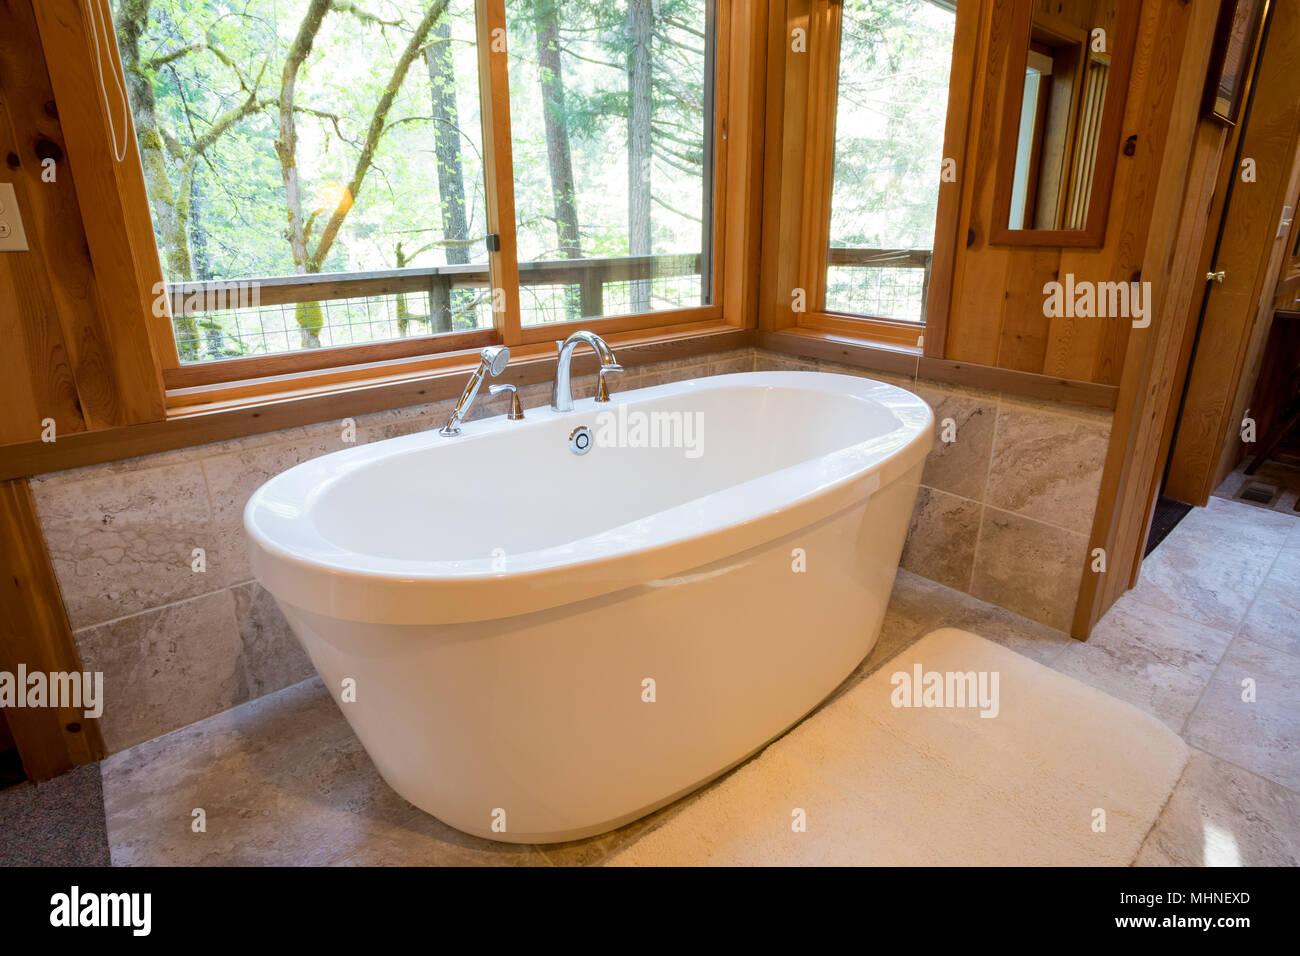 Soaking Bath Tub in Cabin Stock Photo: 183025541 - Alamy